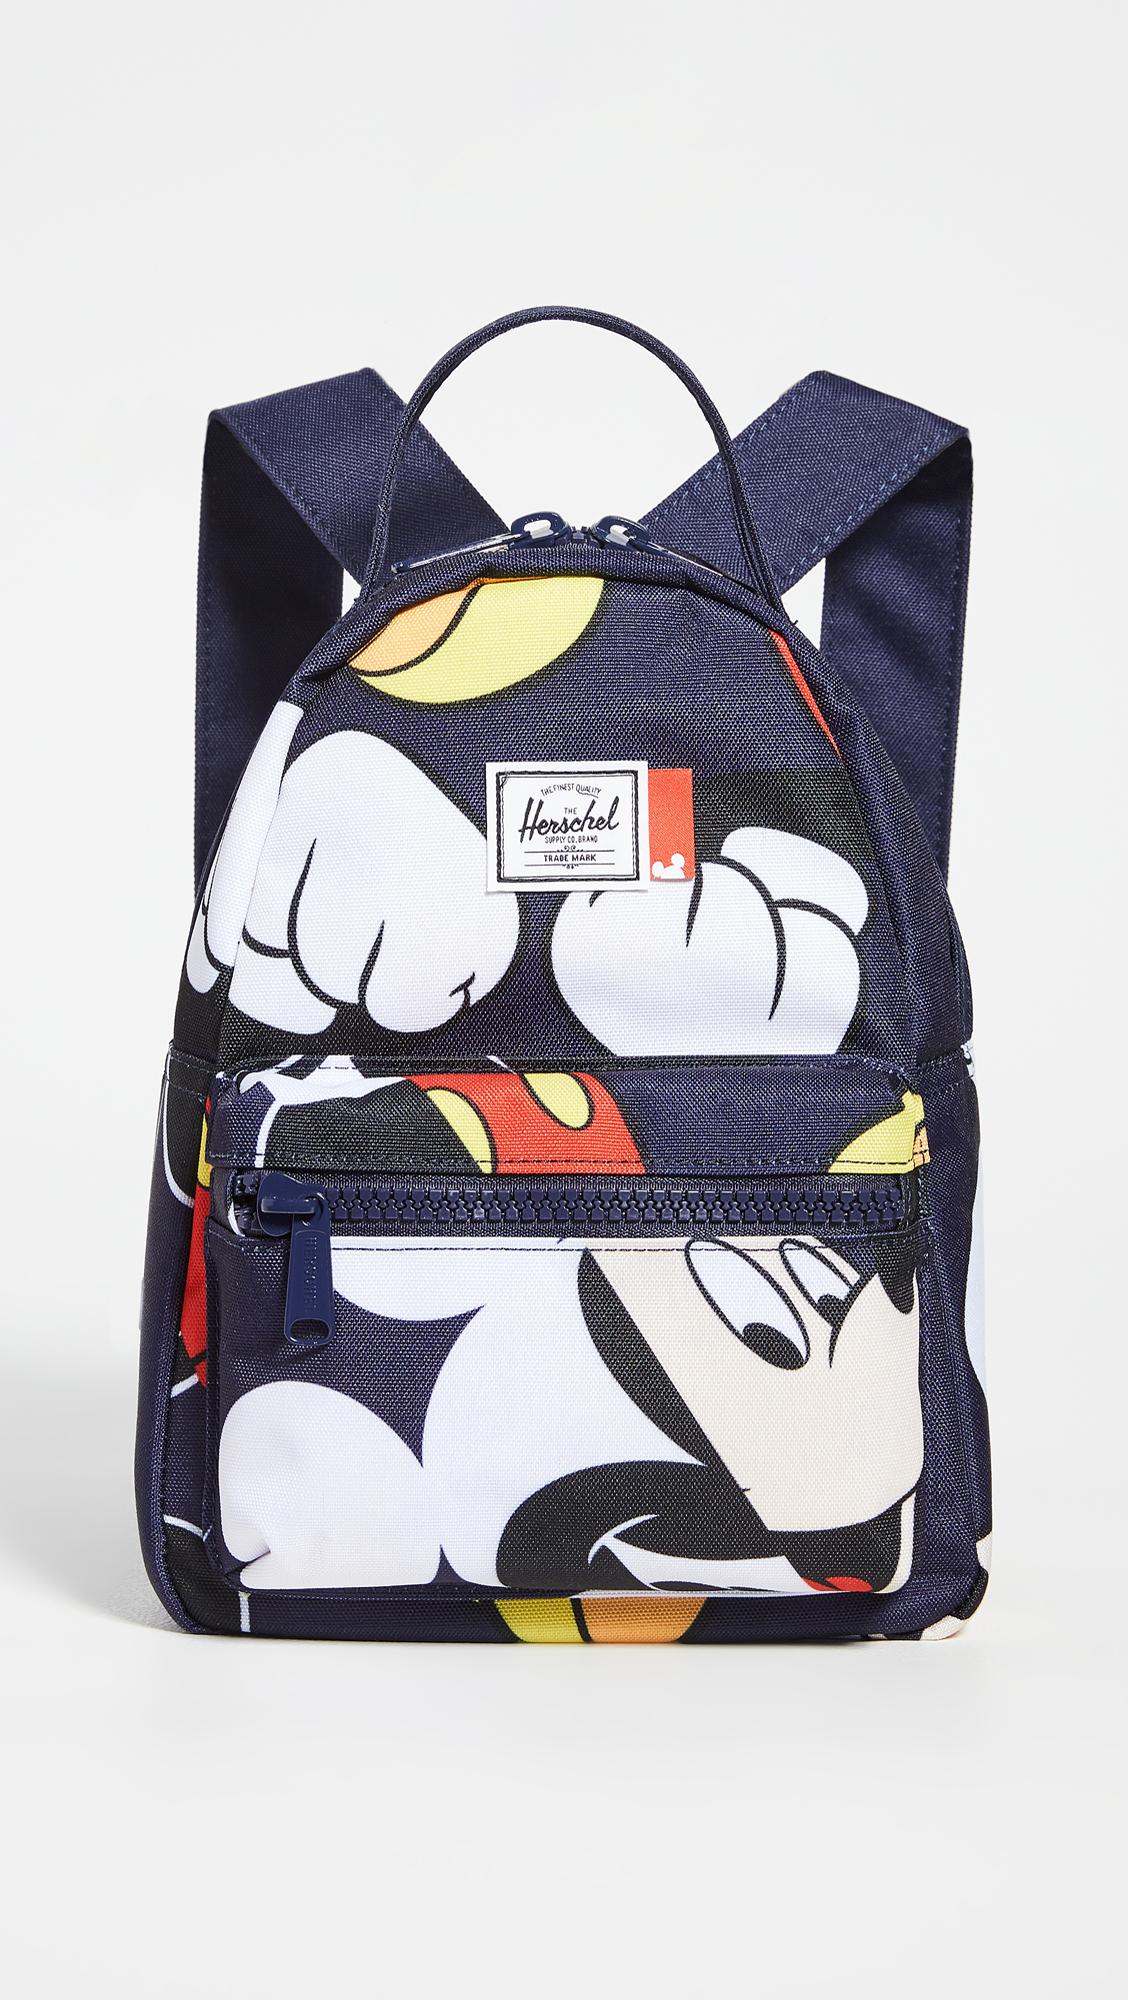 Herschel Supply Co. x Disney Nova Mini Backpack